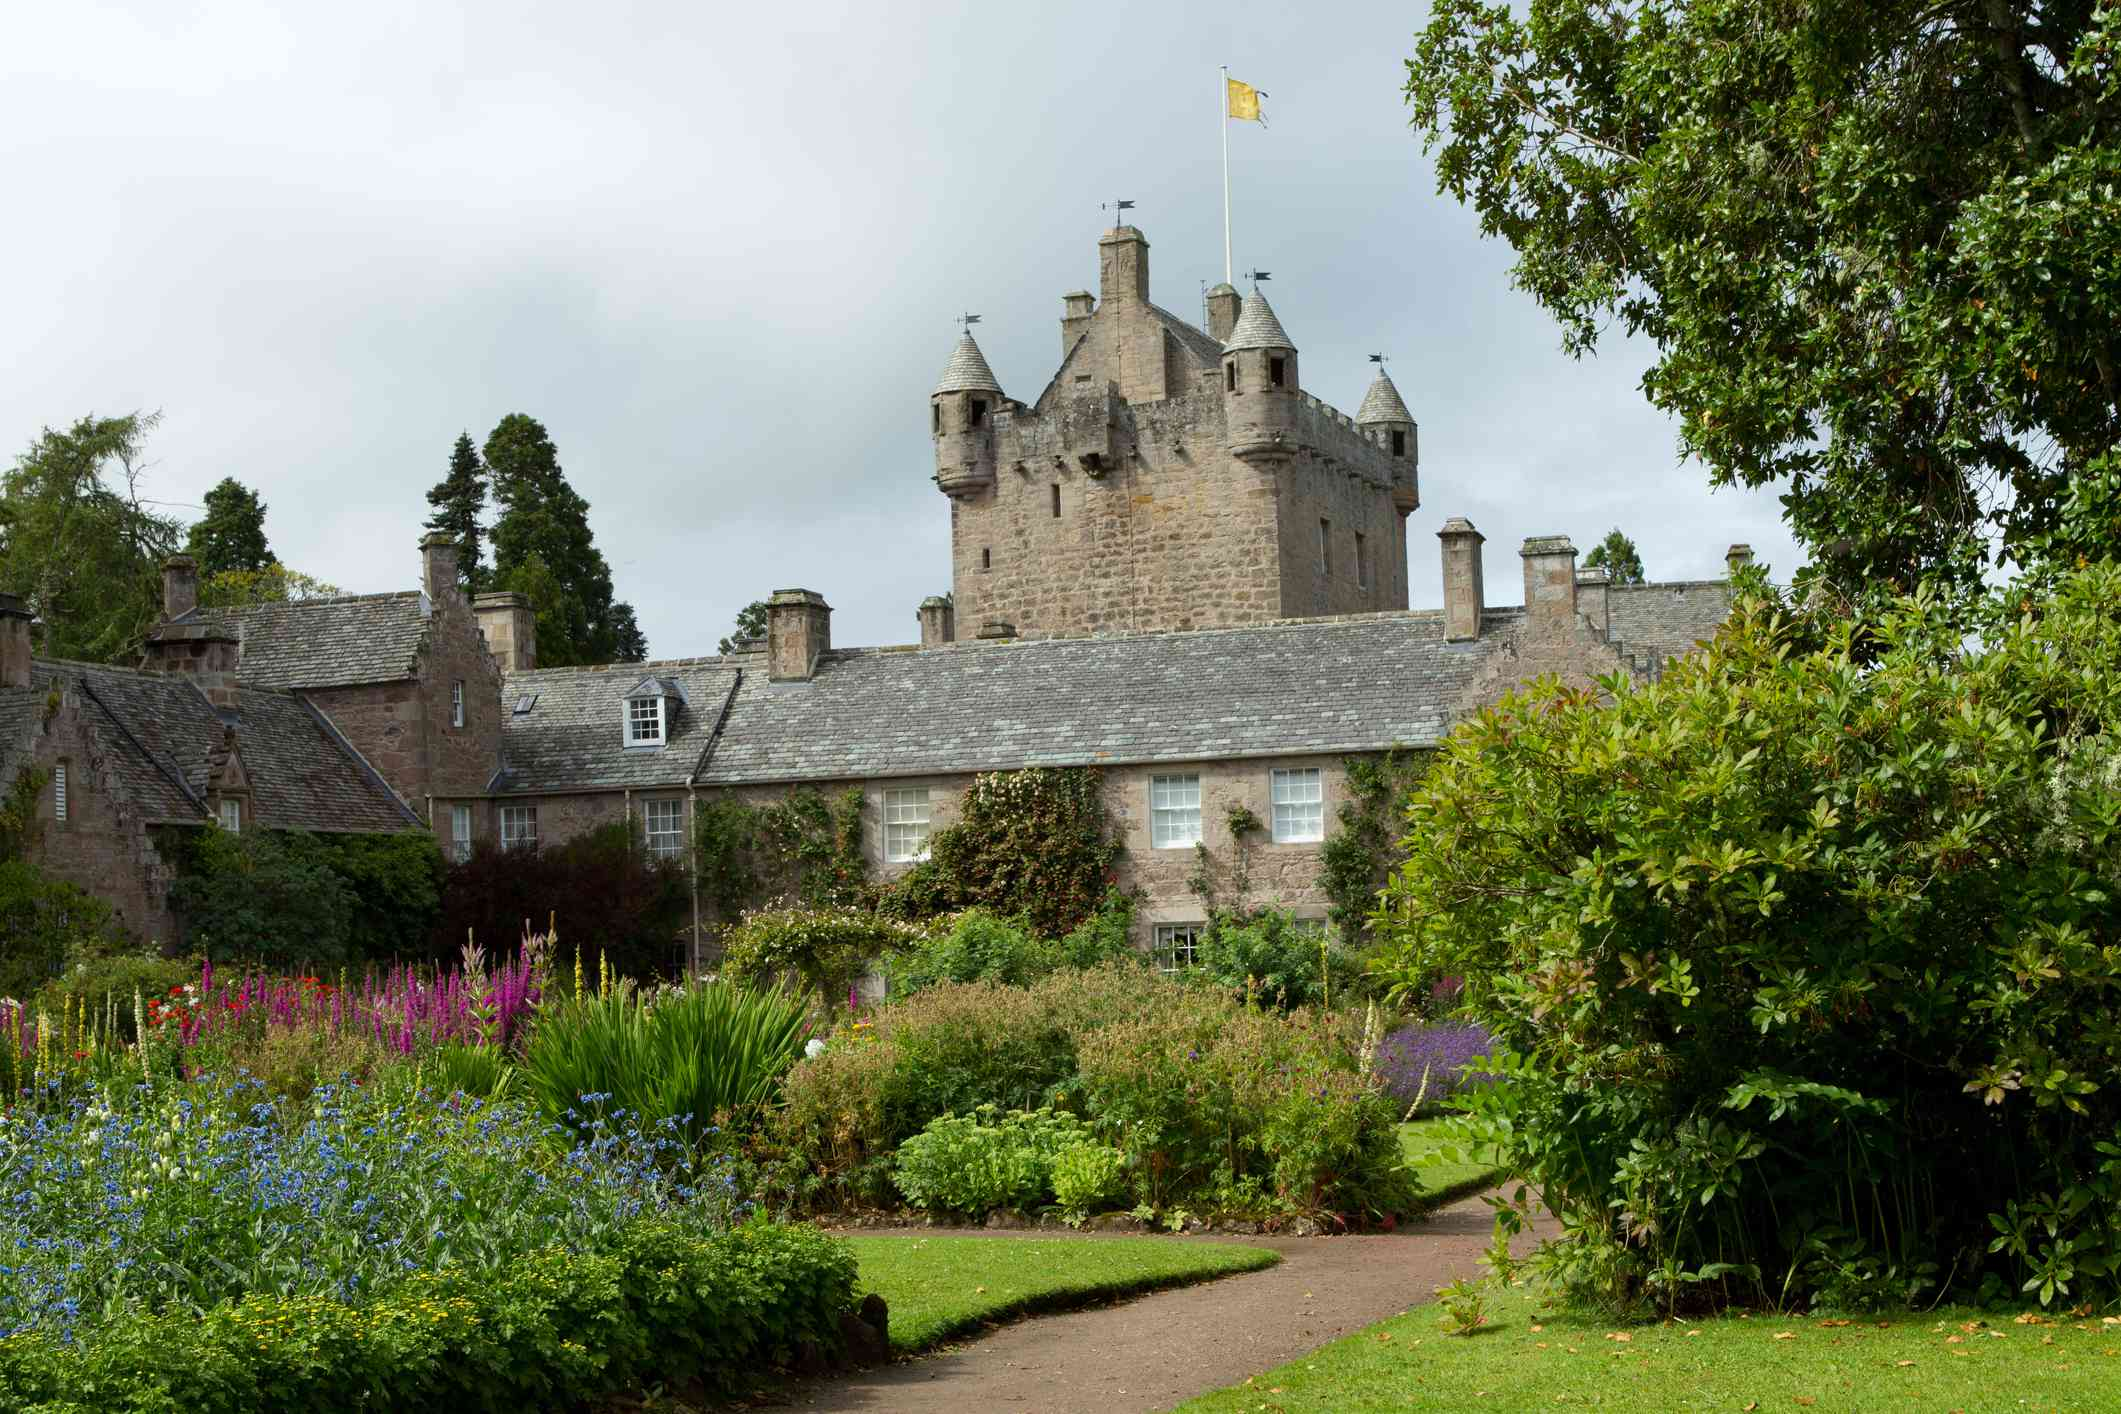 Fairytale castle and gardens found at Cawdor Castle Cawdor Castle in Scotland